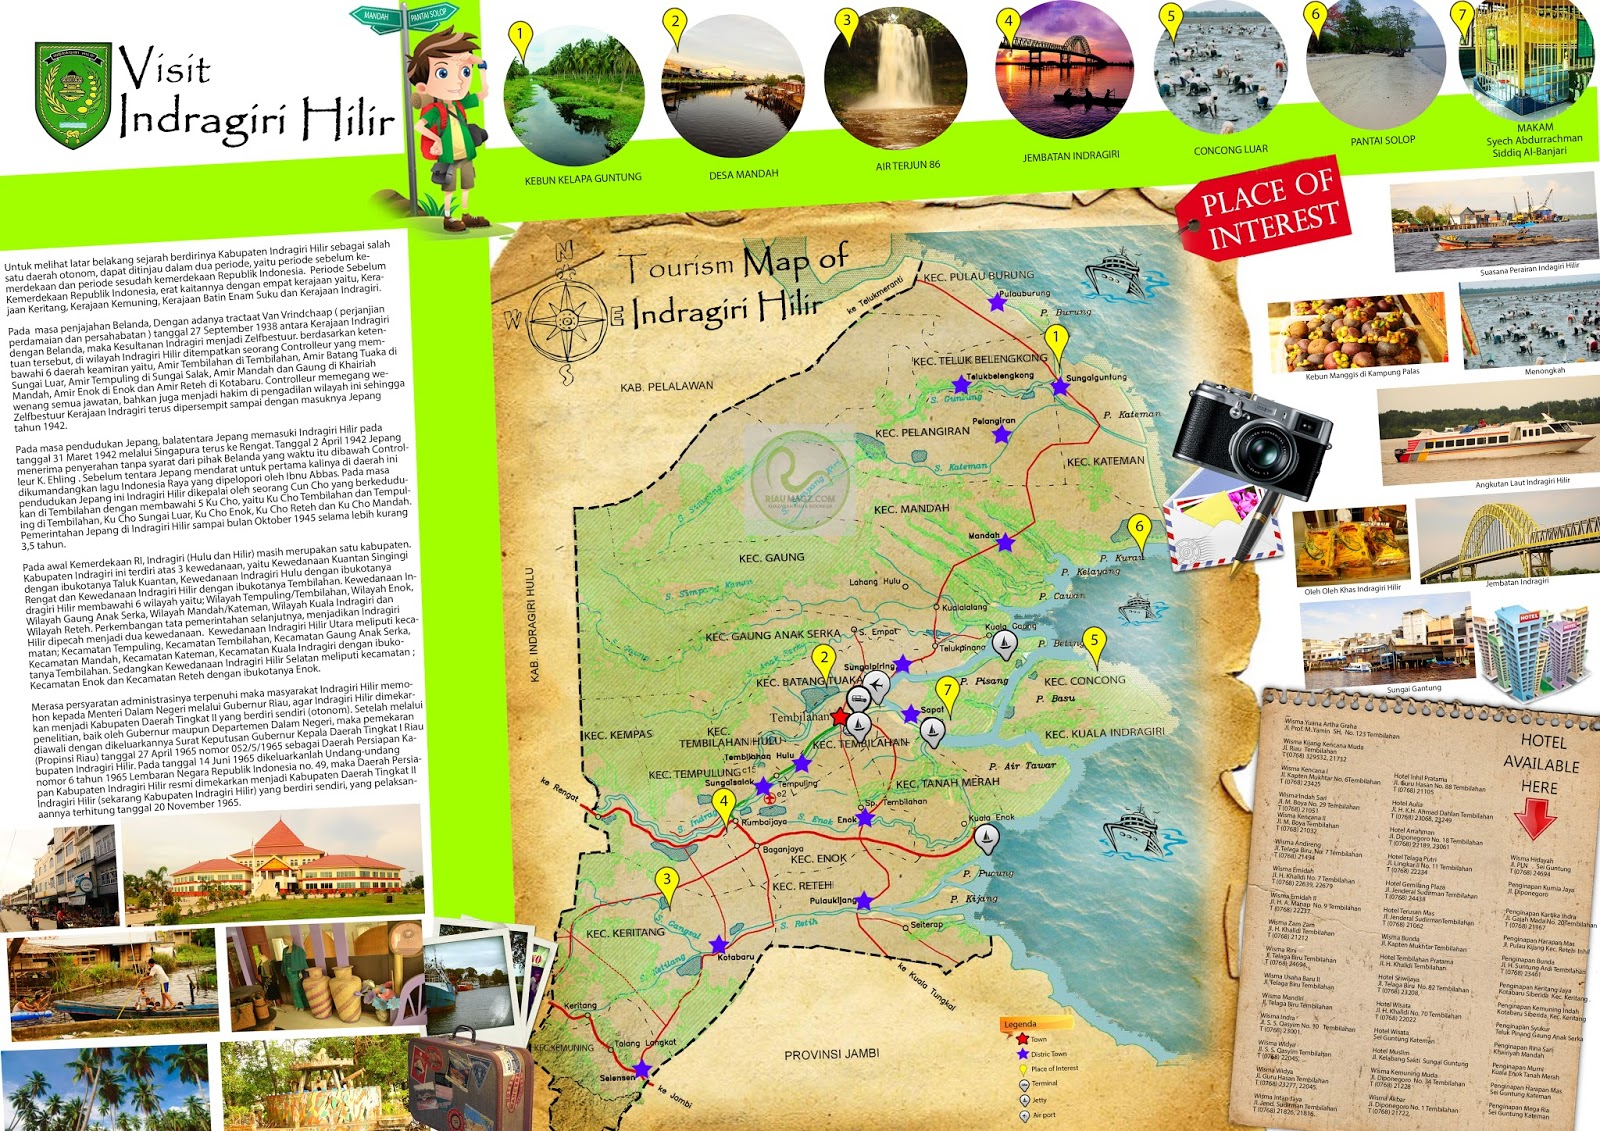 Peta Wisata Kabupaten Indragiri Hilir (Inhil) - Tourism